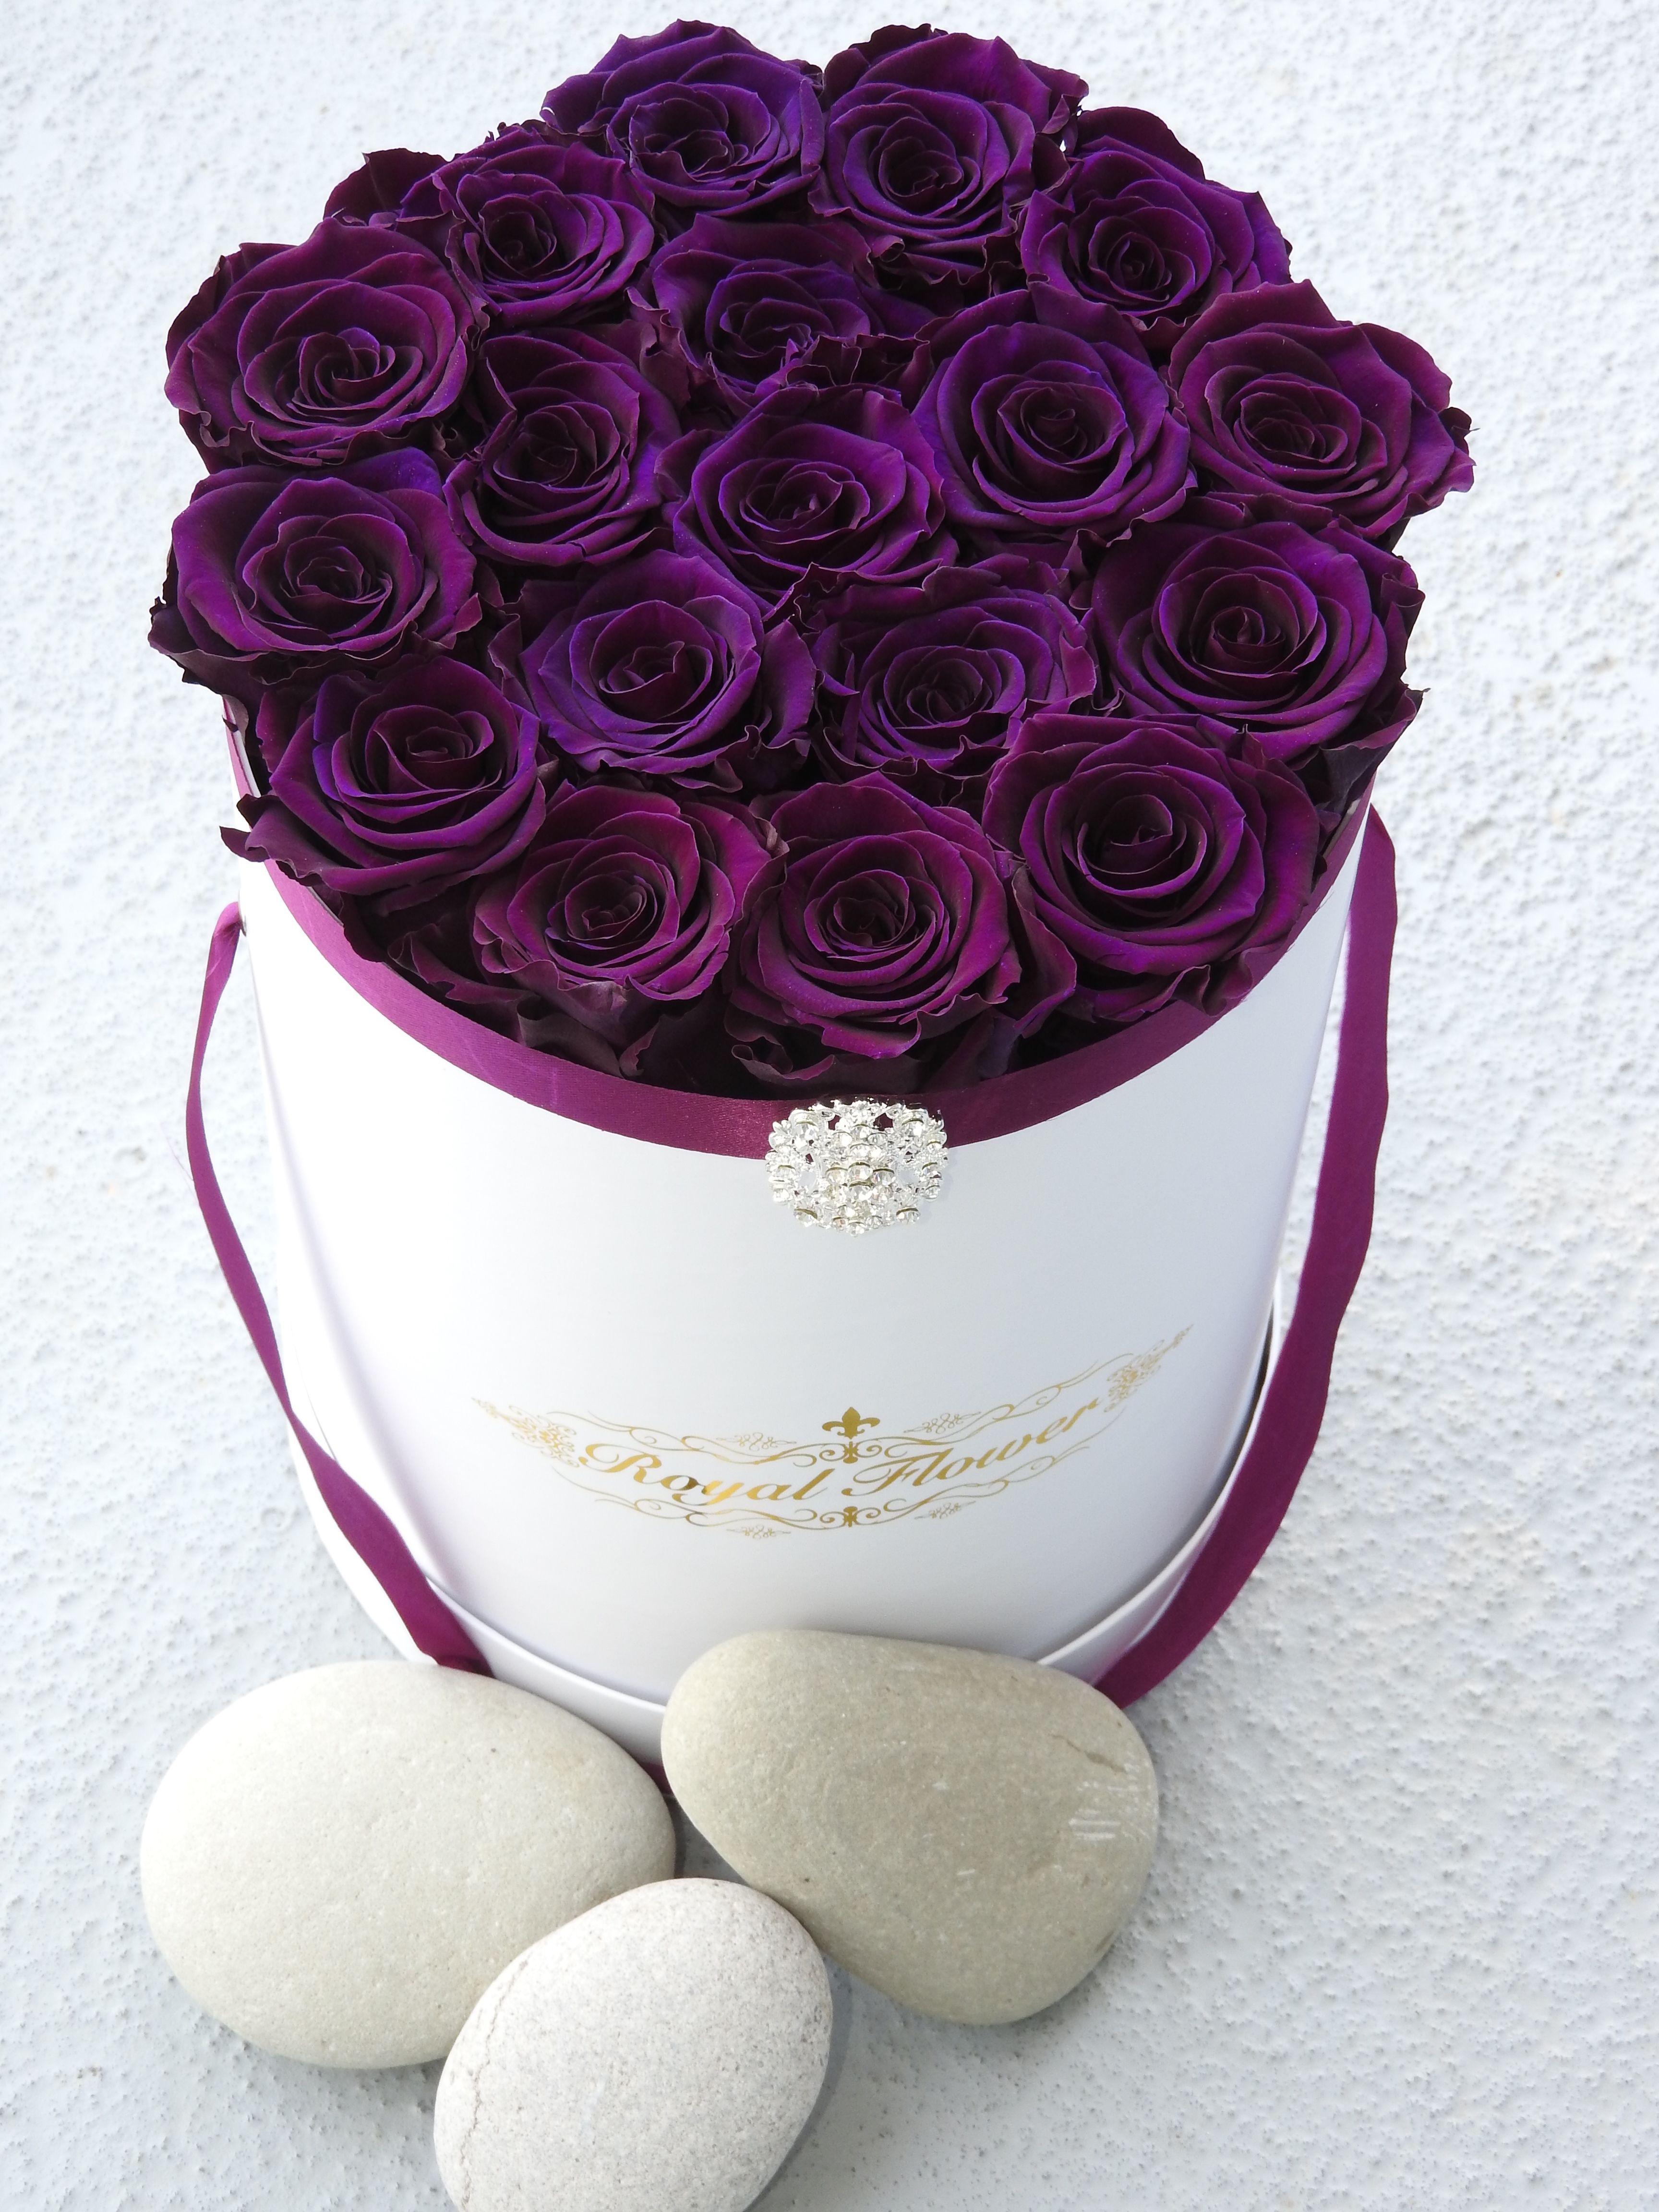 Royal Purple rose box from Royal Flower ♛ ♛Royal Flower